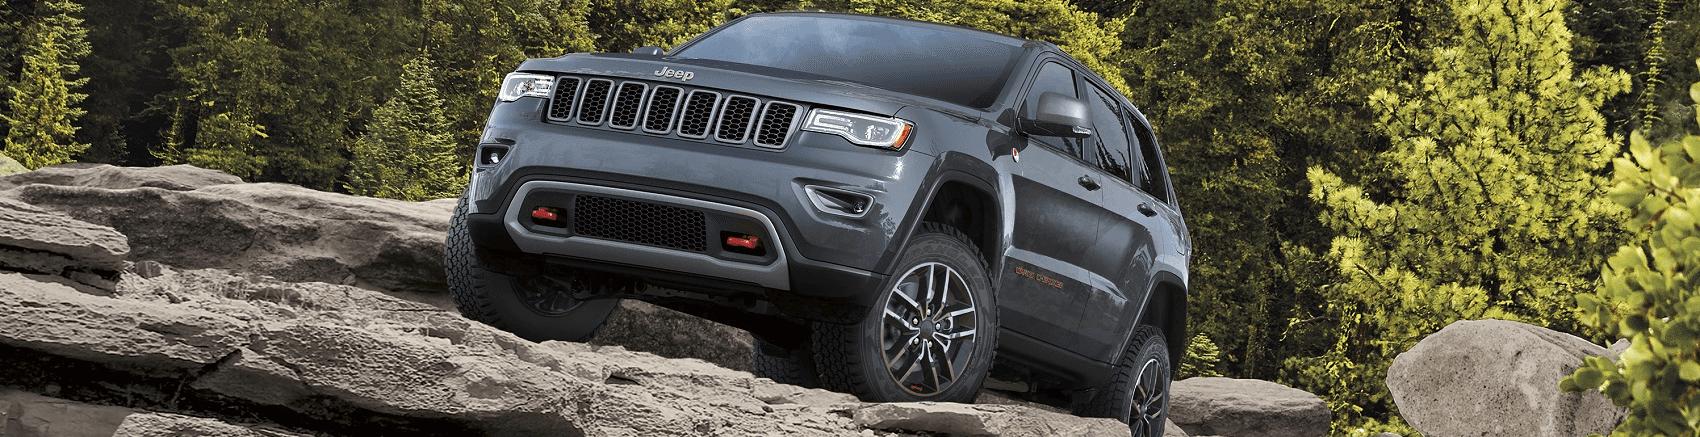 Jeep Grand Cherokee Model